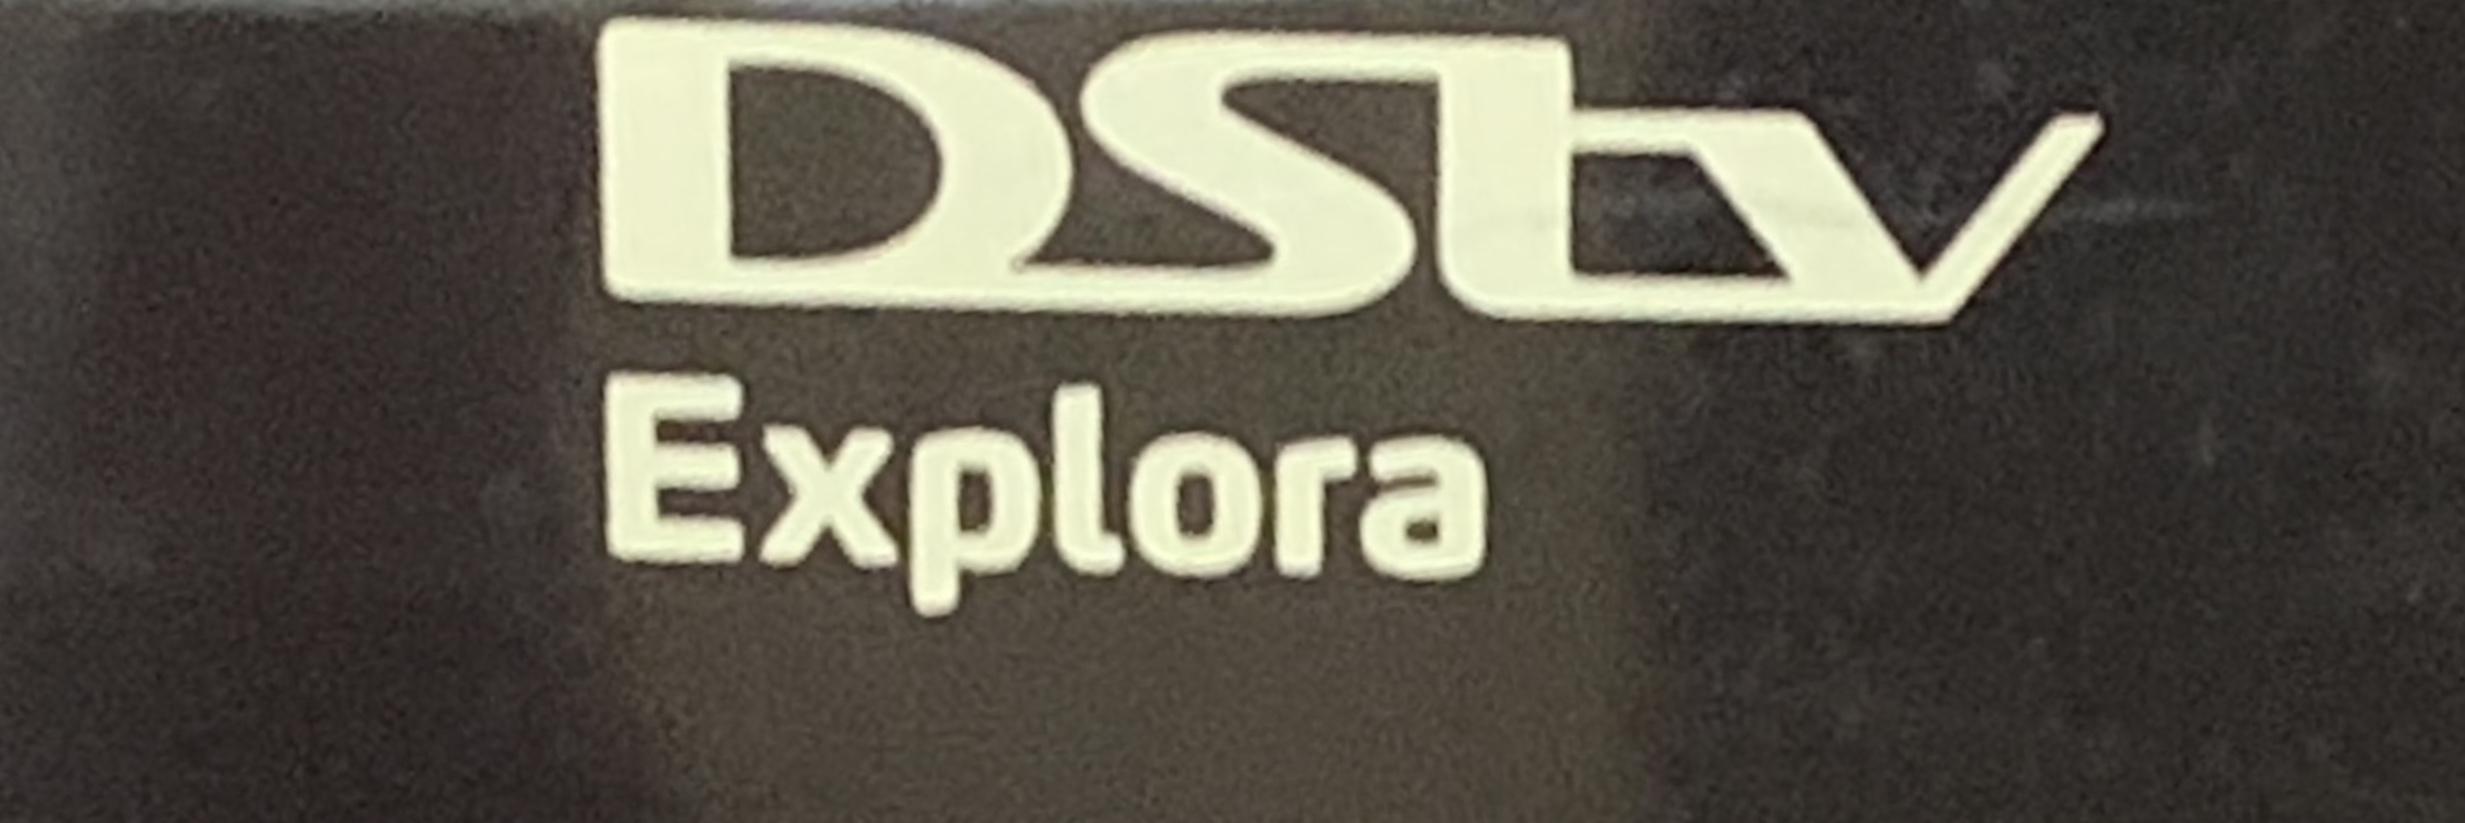 DSTV Explora model no: DPS5001IMC with remote control